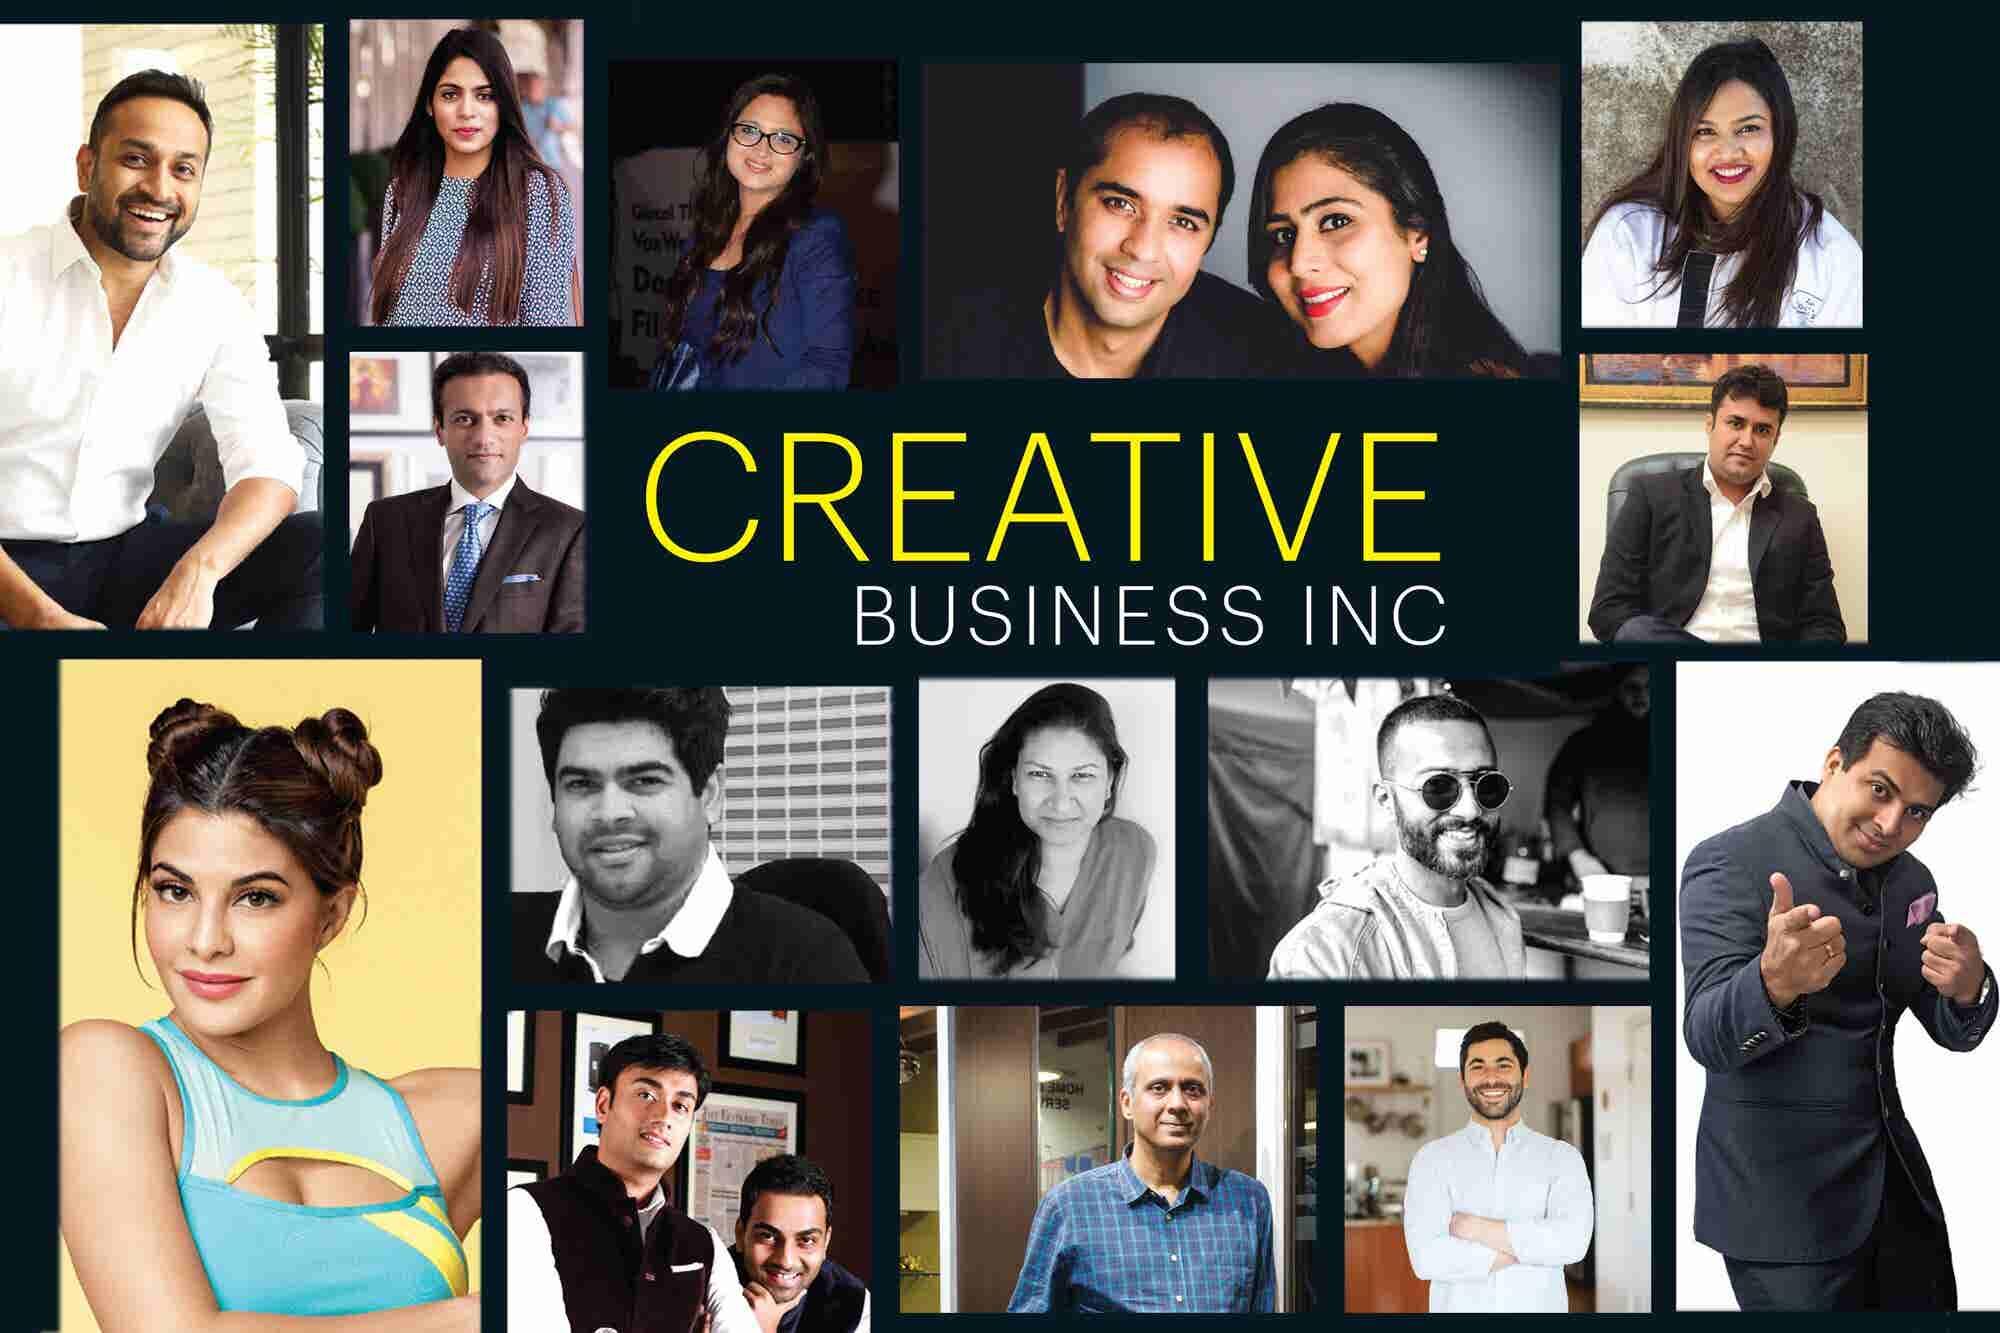 15 Entrepreneurs Share the Secrets of Their Creative Life